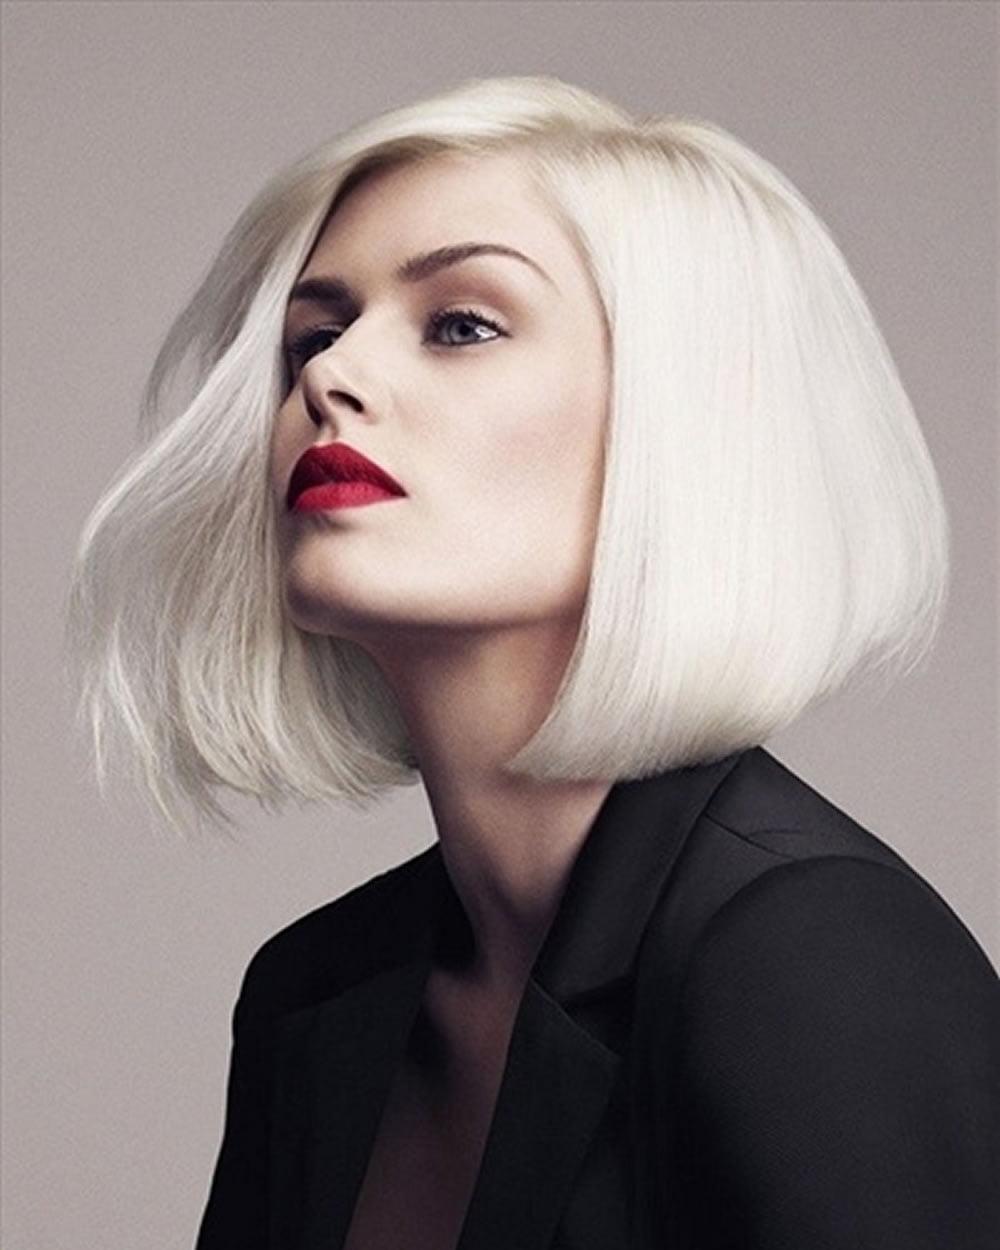 Прически на средние волосы фото женские 2018 2018